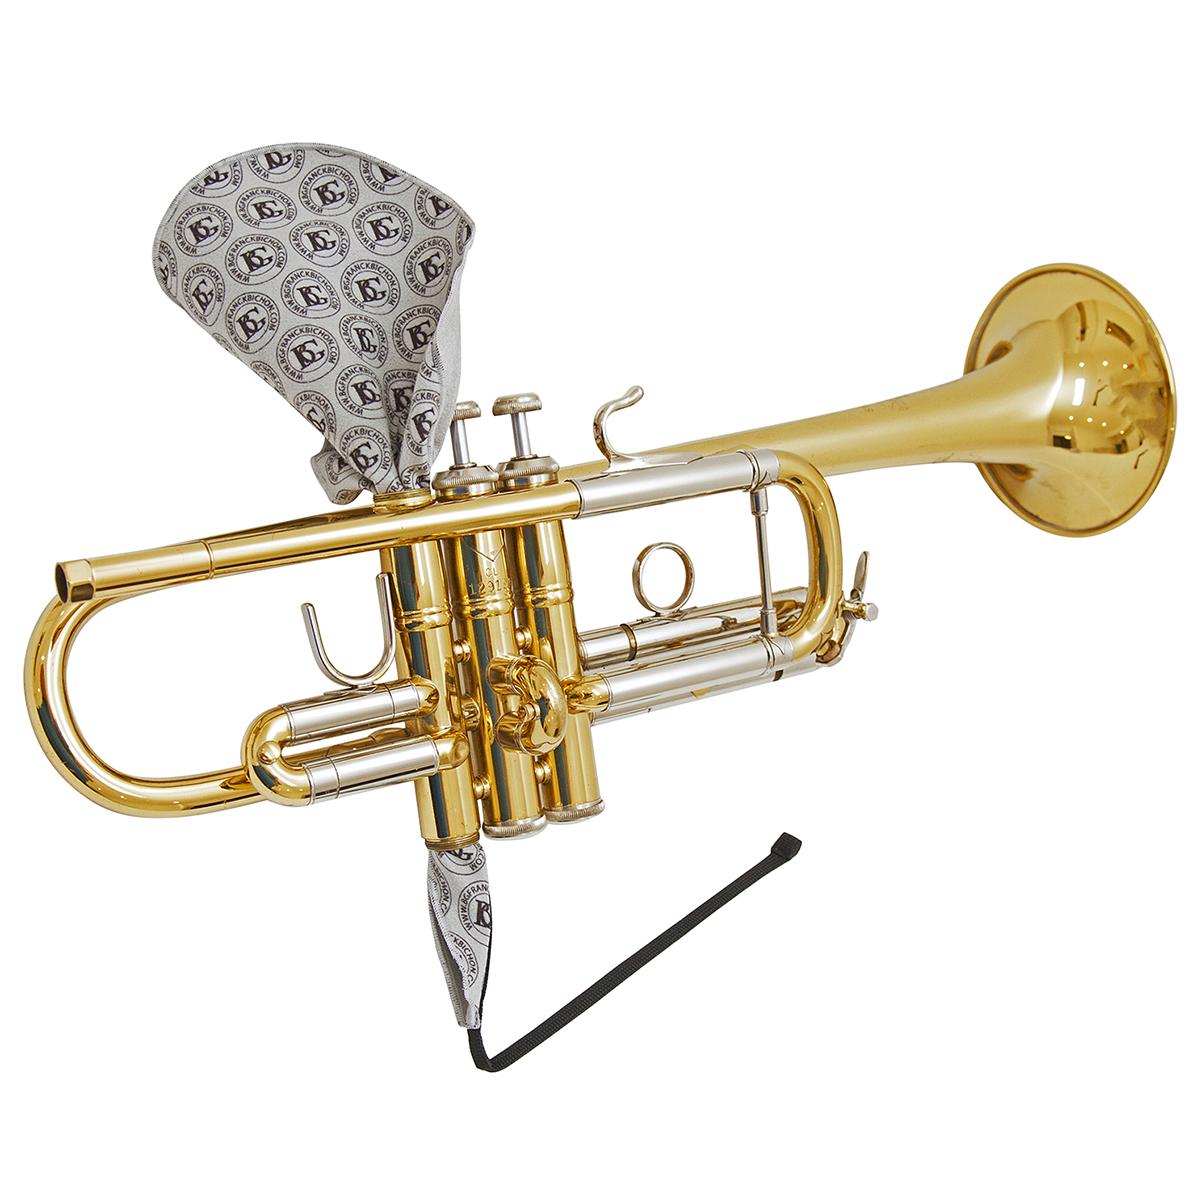 BG A31 T1 Trumpet Valve Casing Swab